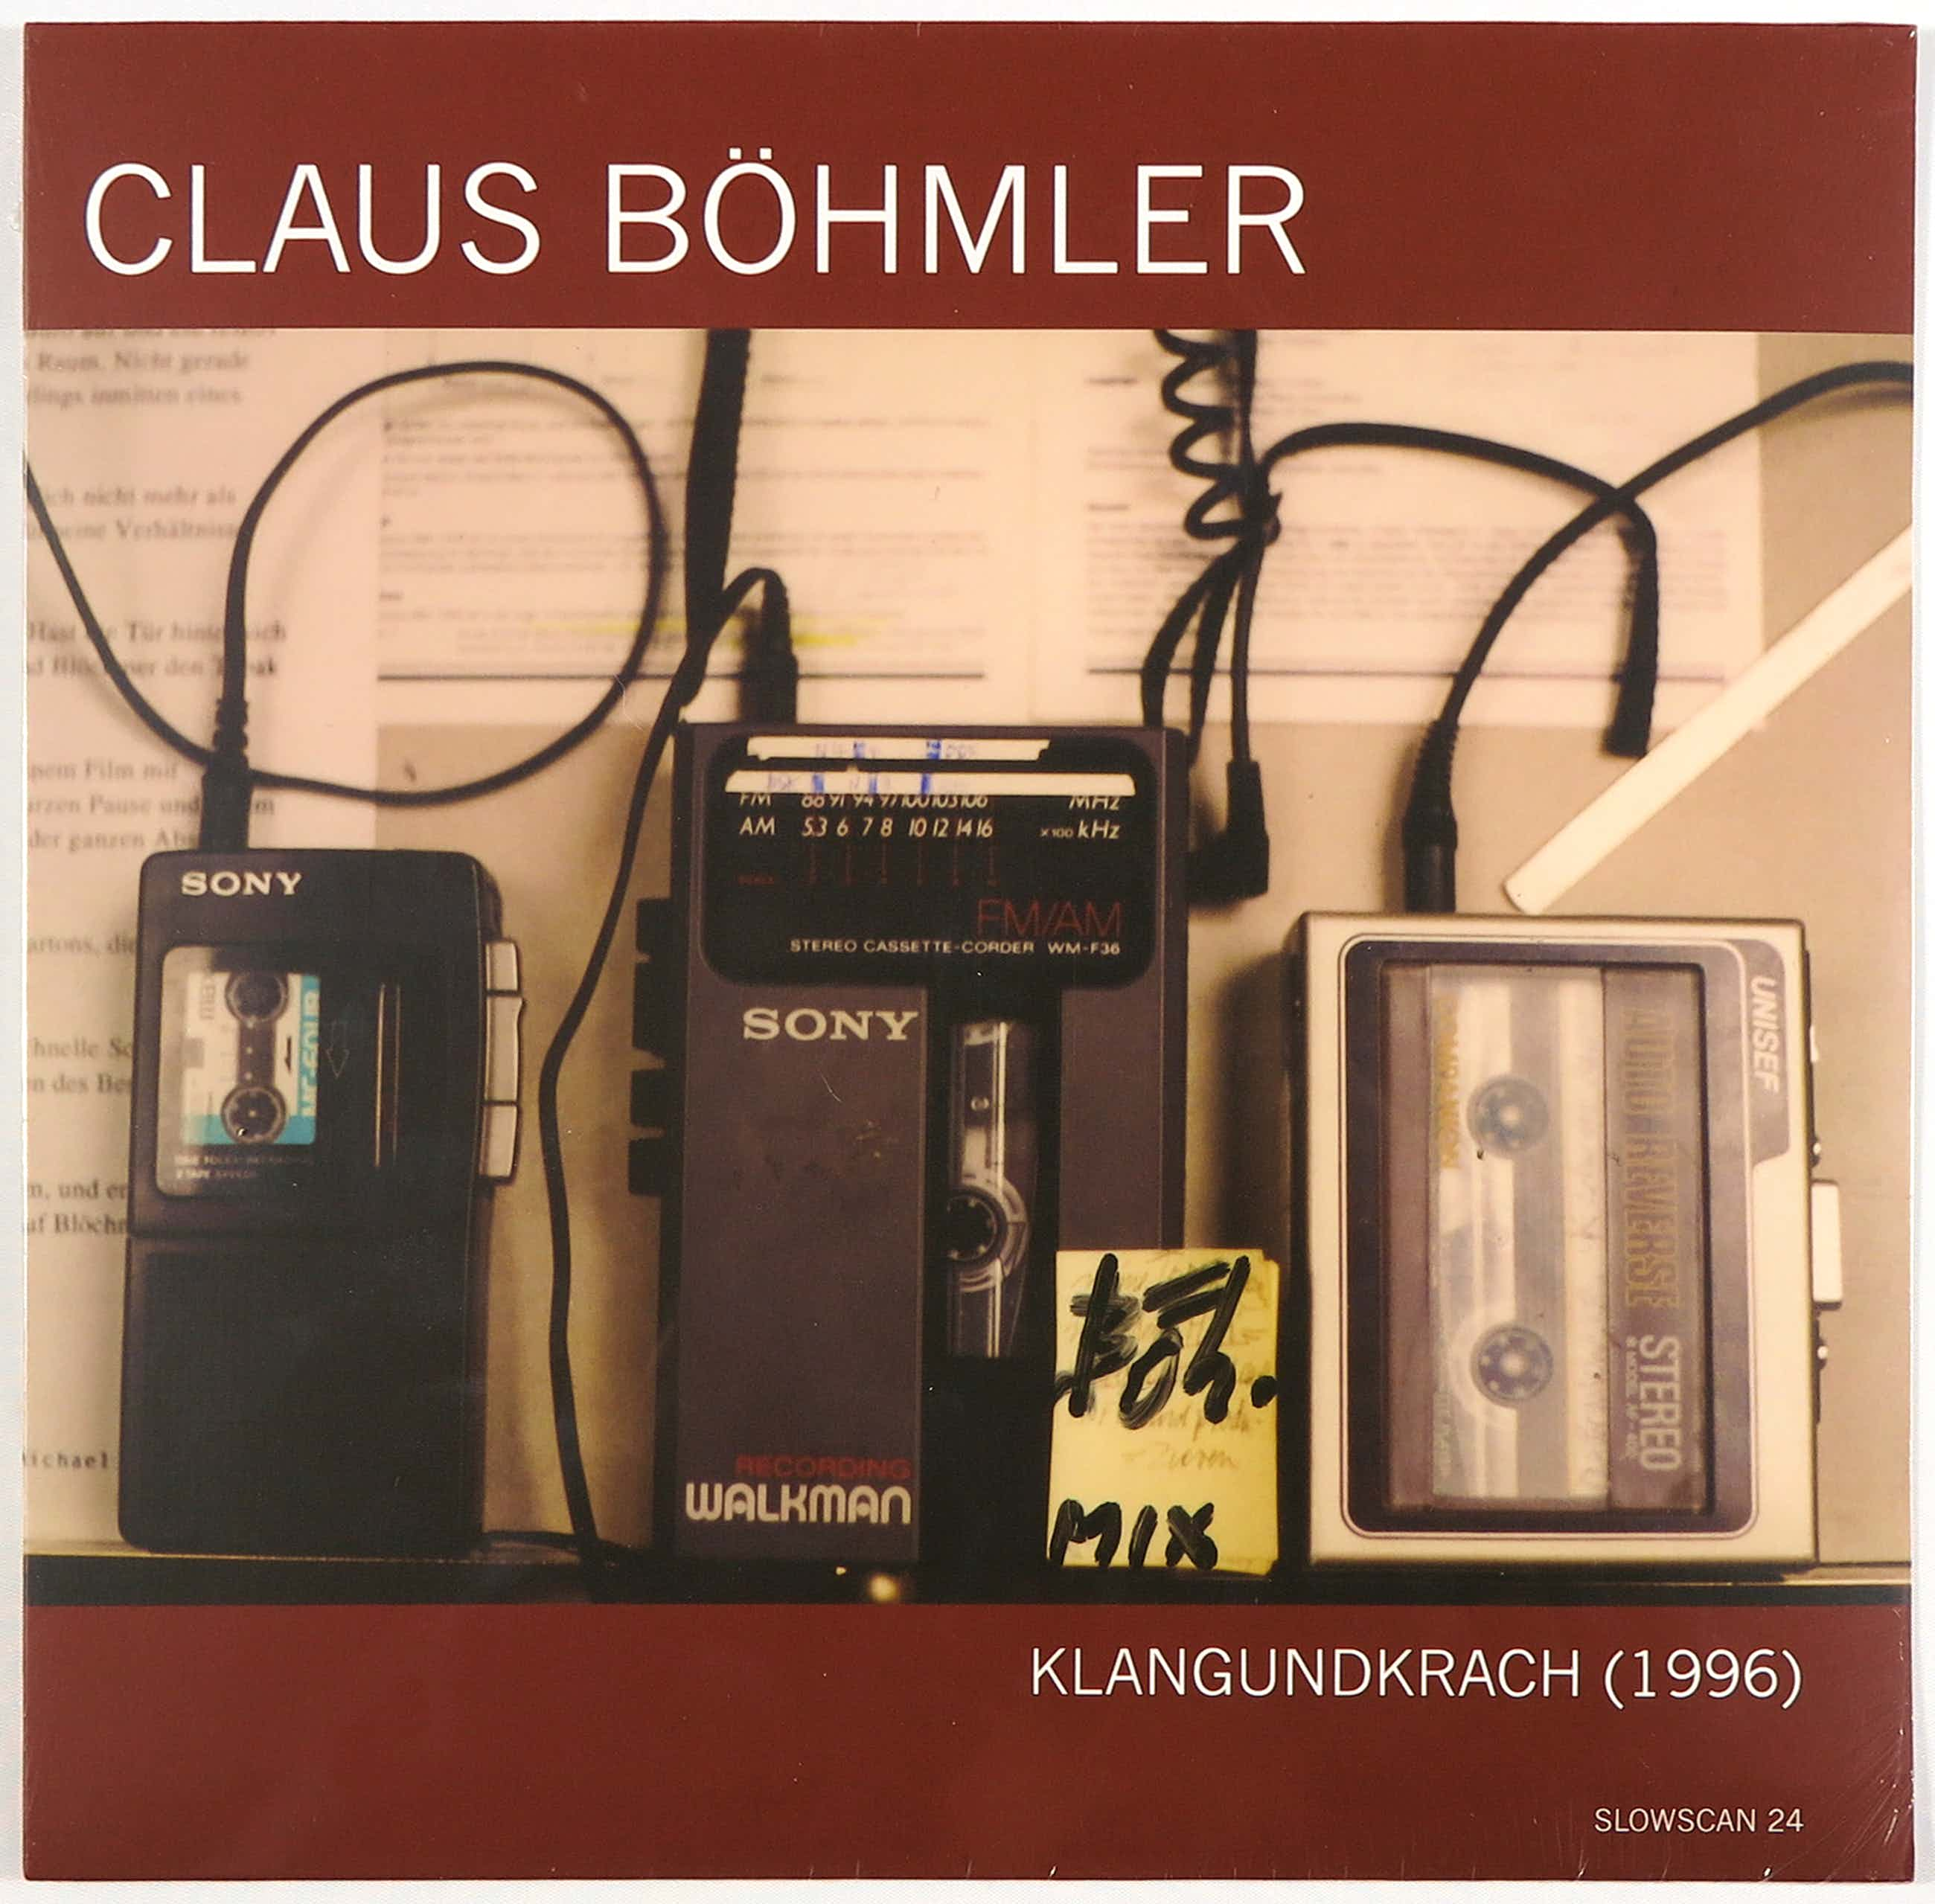 Claus Böhmler - Klangundkrach (1996) kopen? Bied vanaf 12!